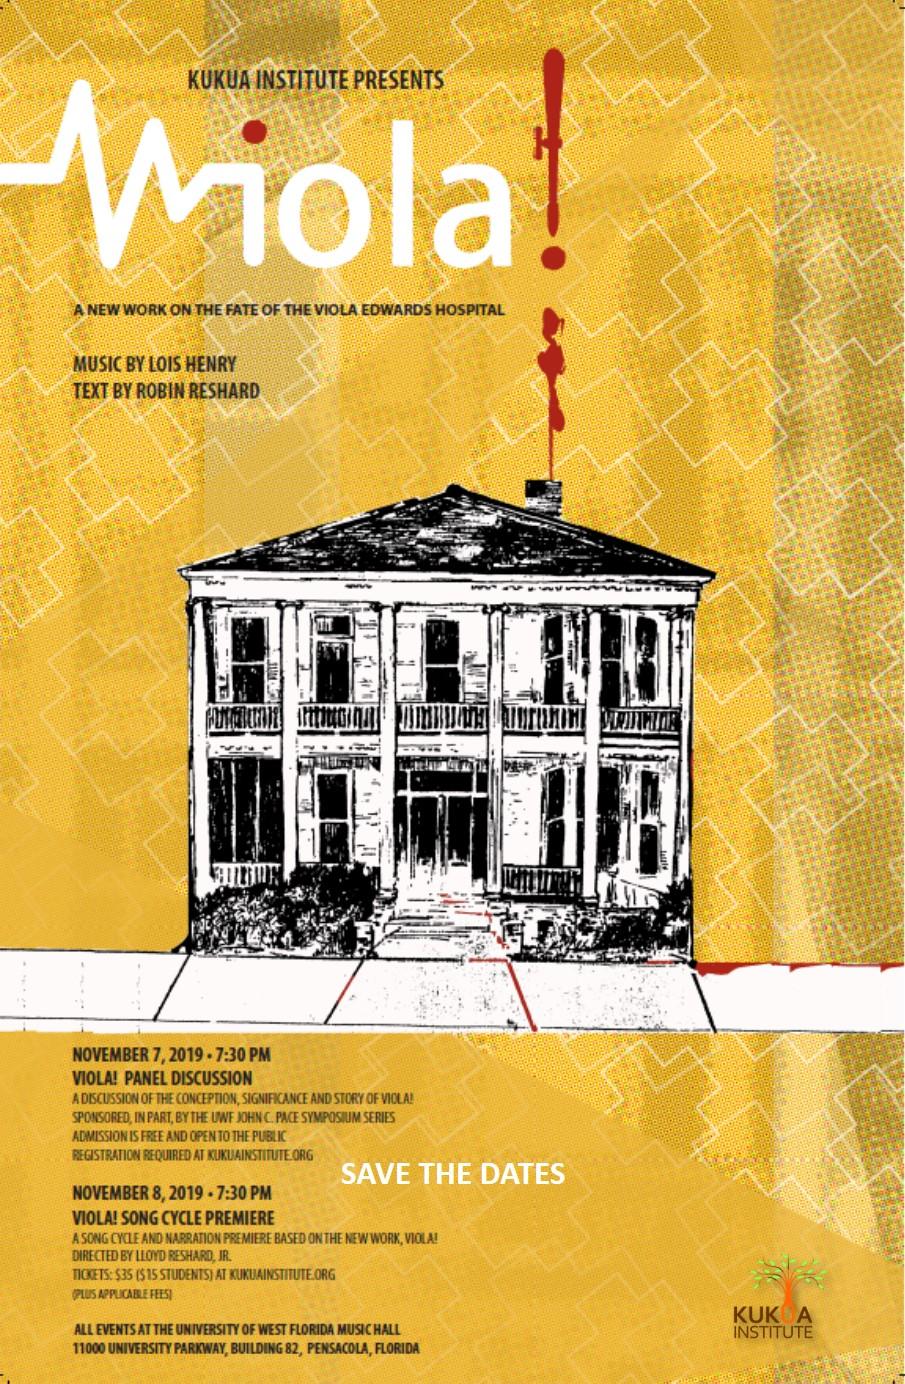 Viola! Song Cycle Premiere